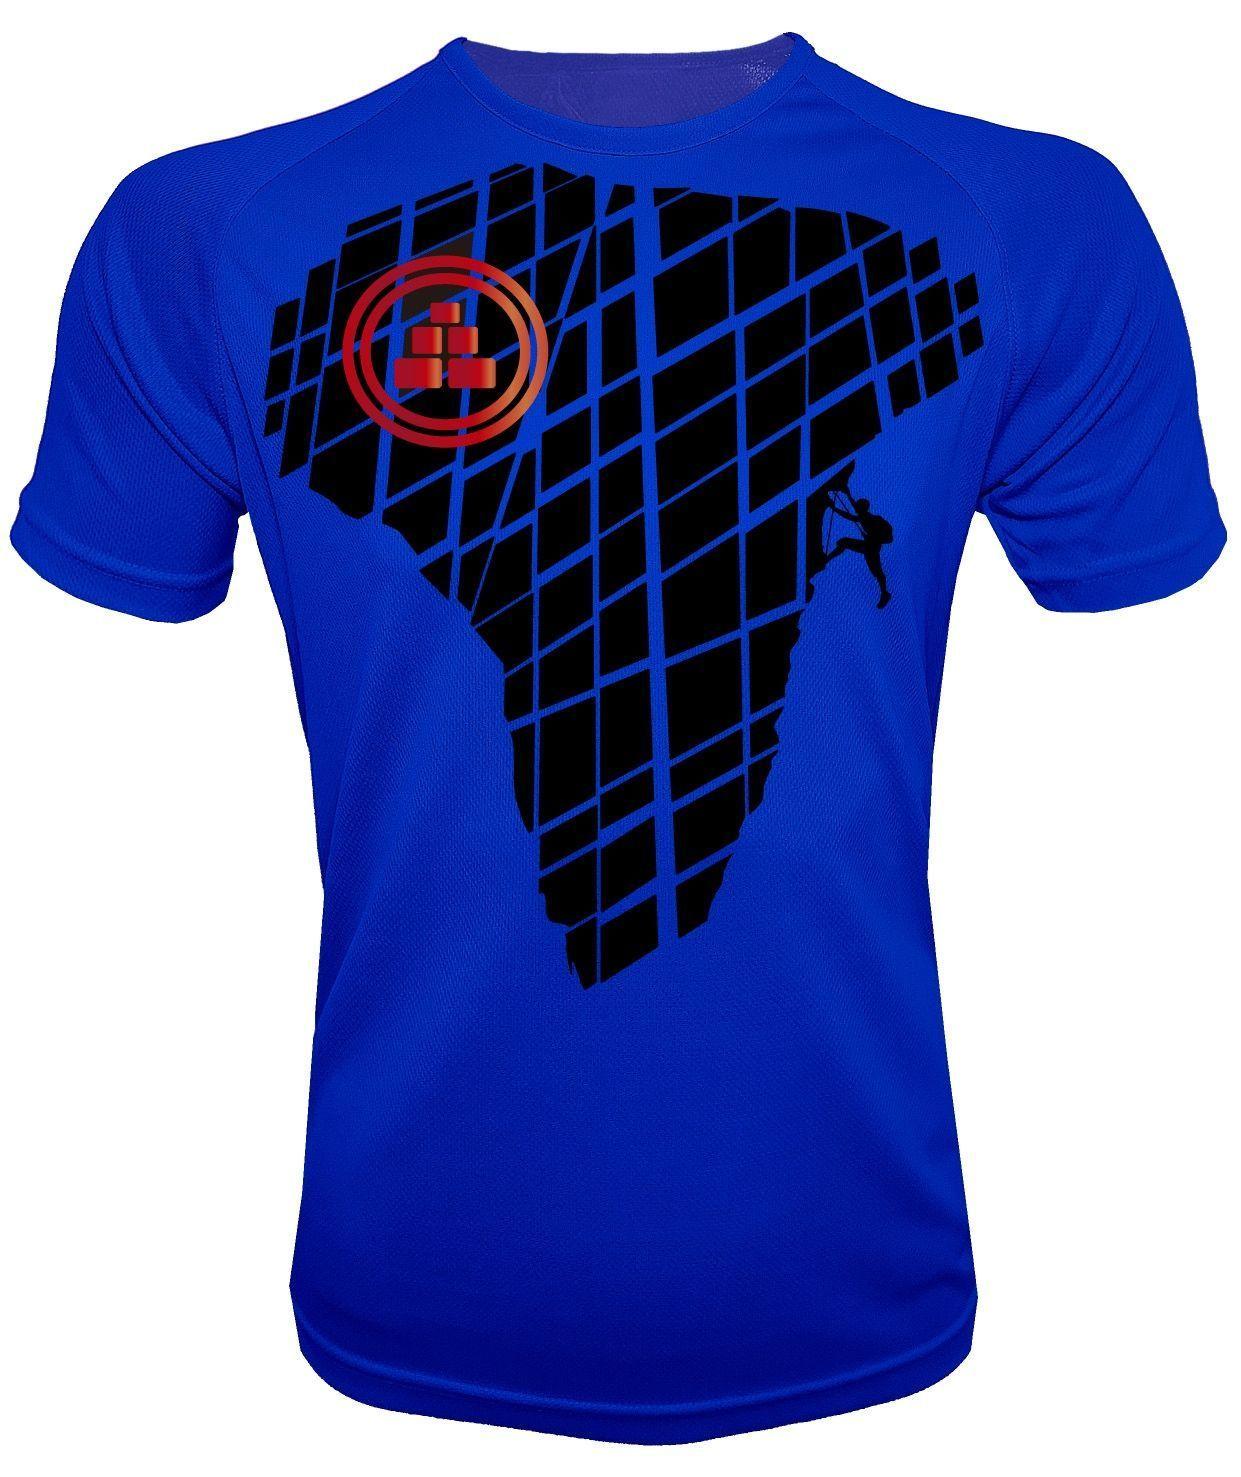 Camiseta deportiva montaña AR